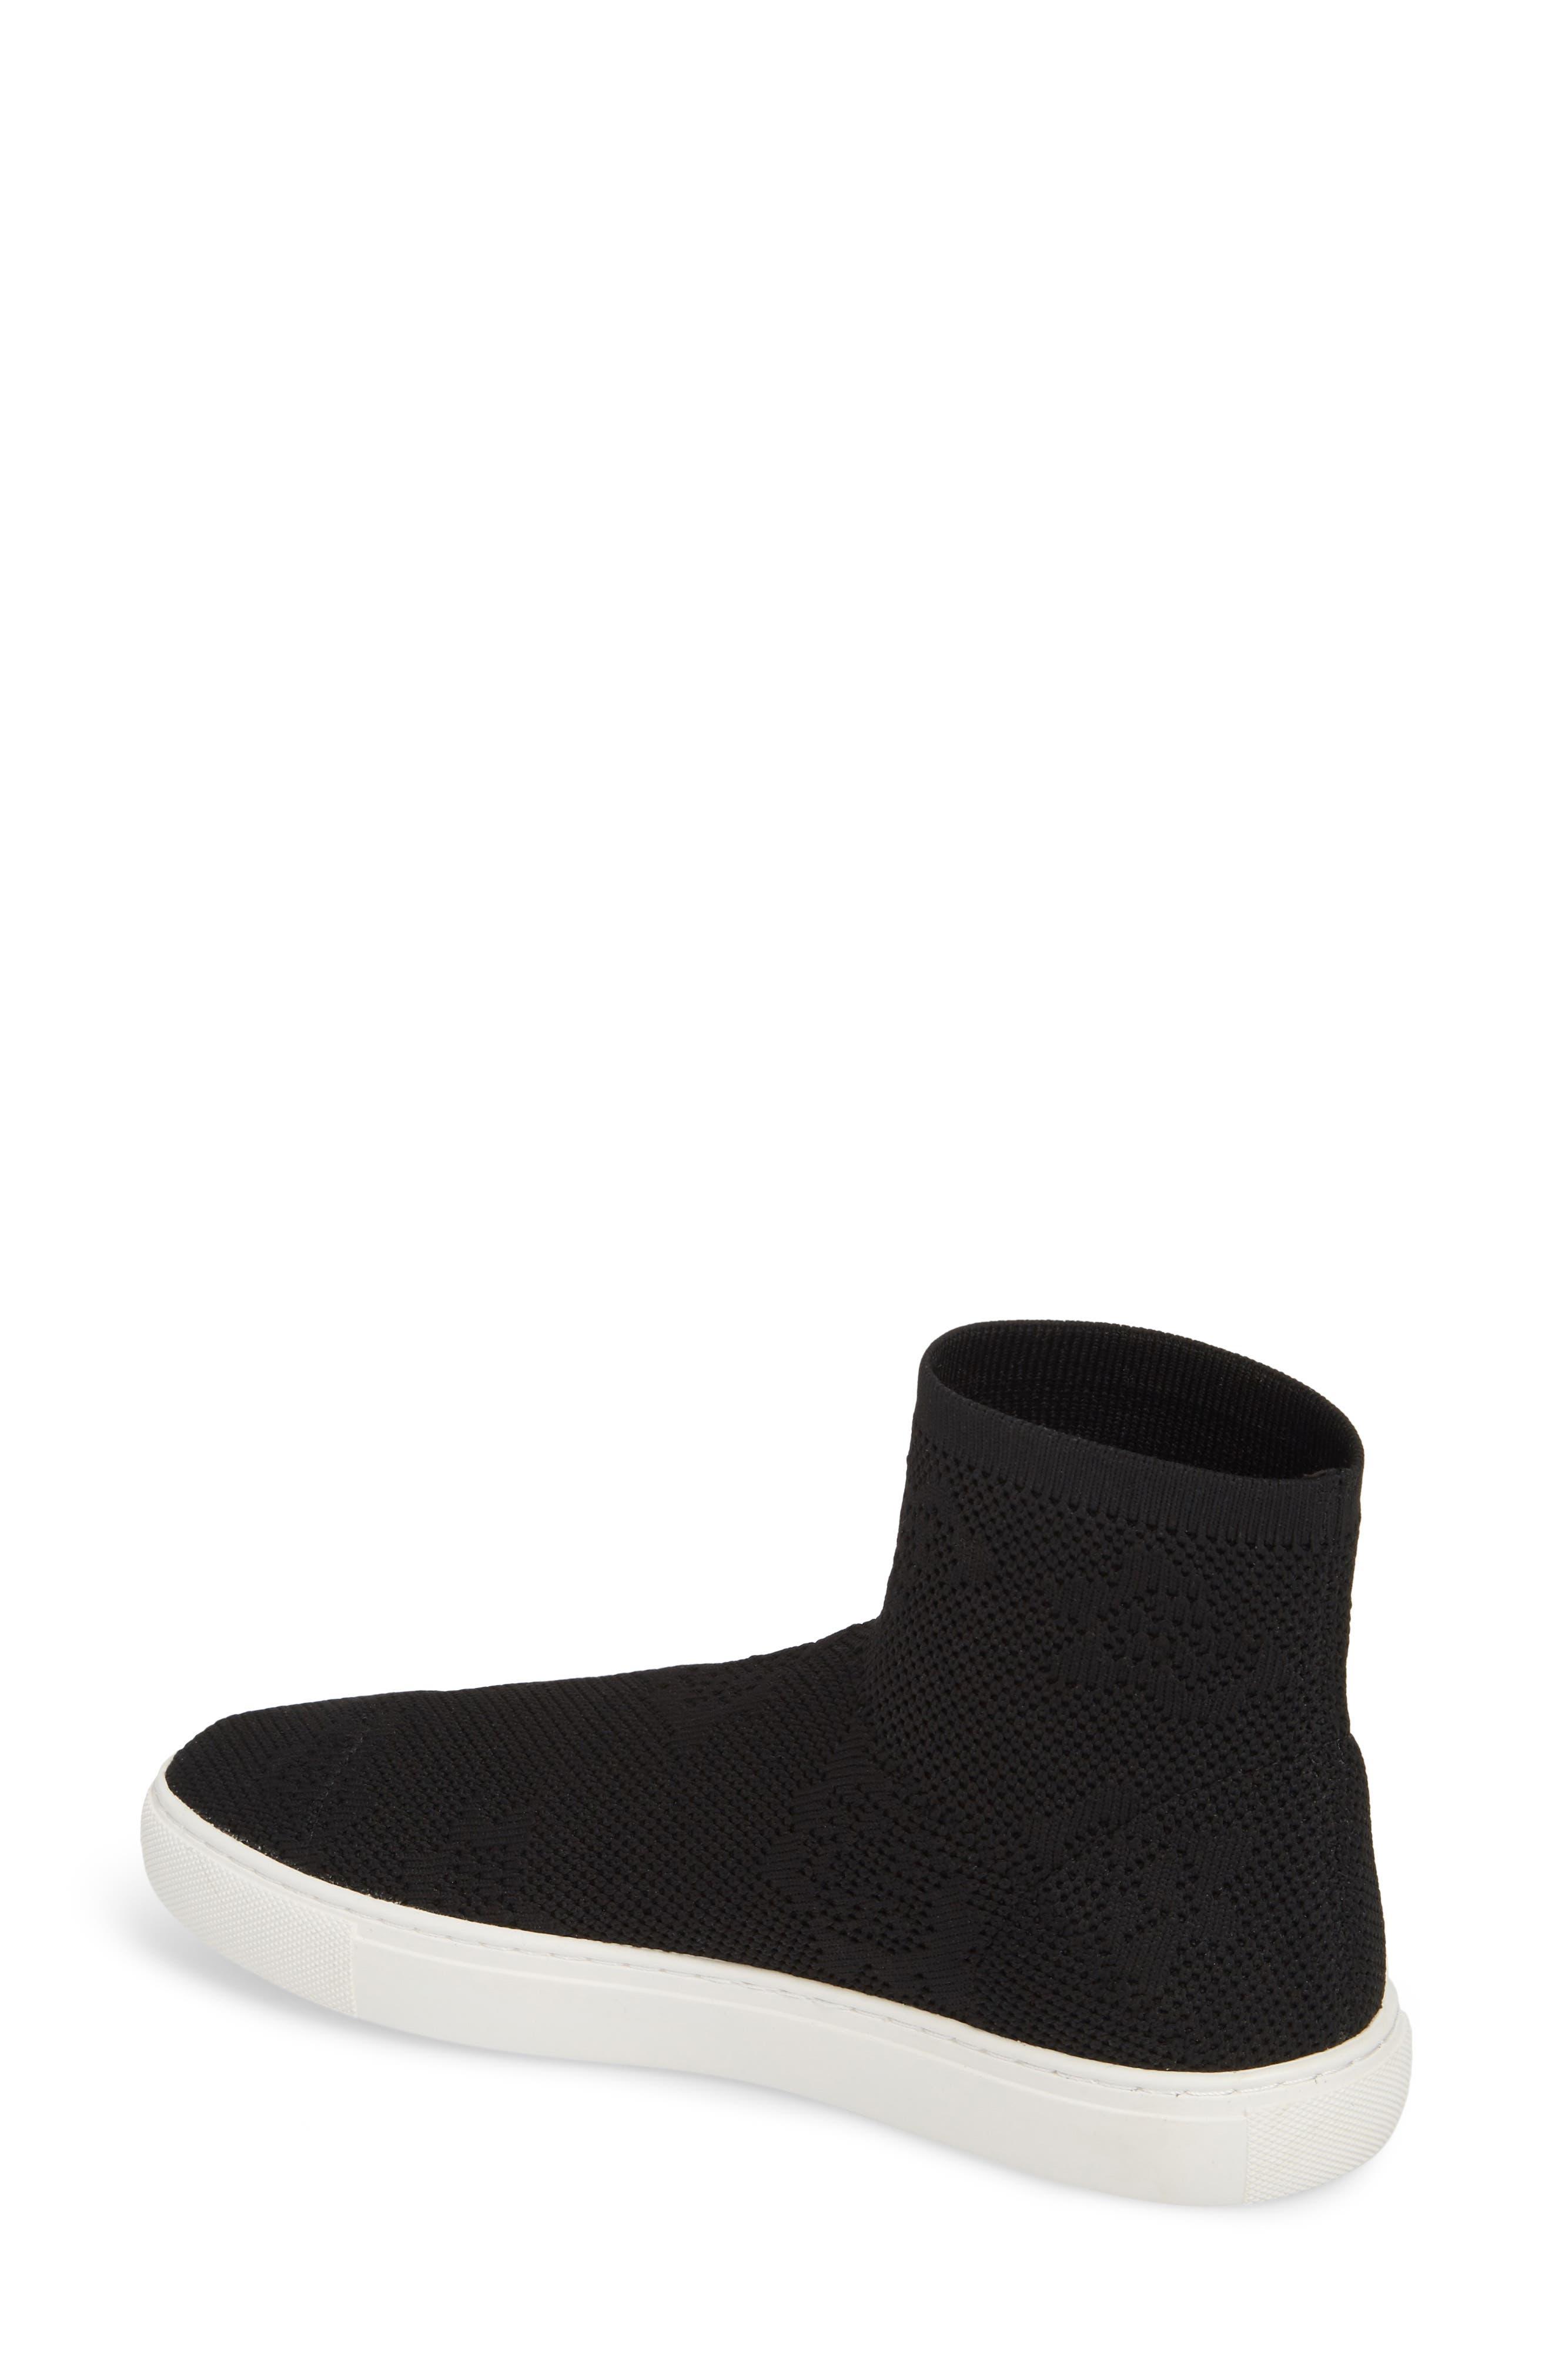 Keating Sneaker,                             Alternate thumbnail 4, color,